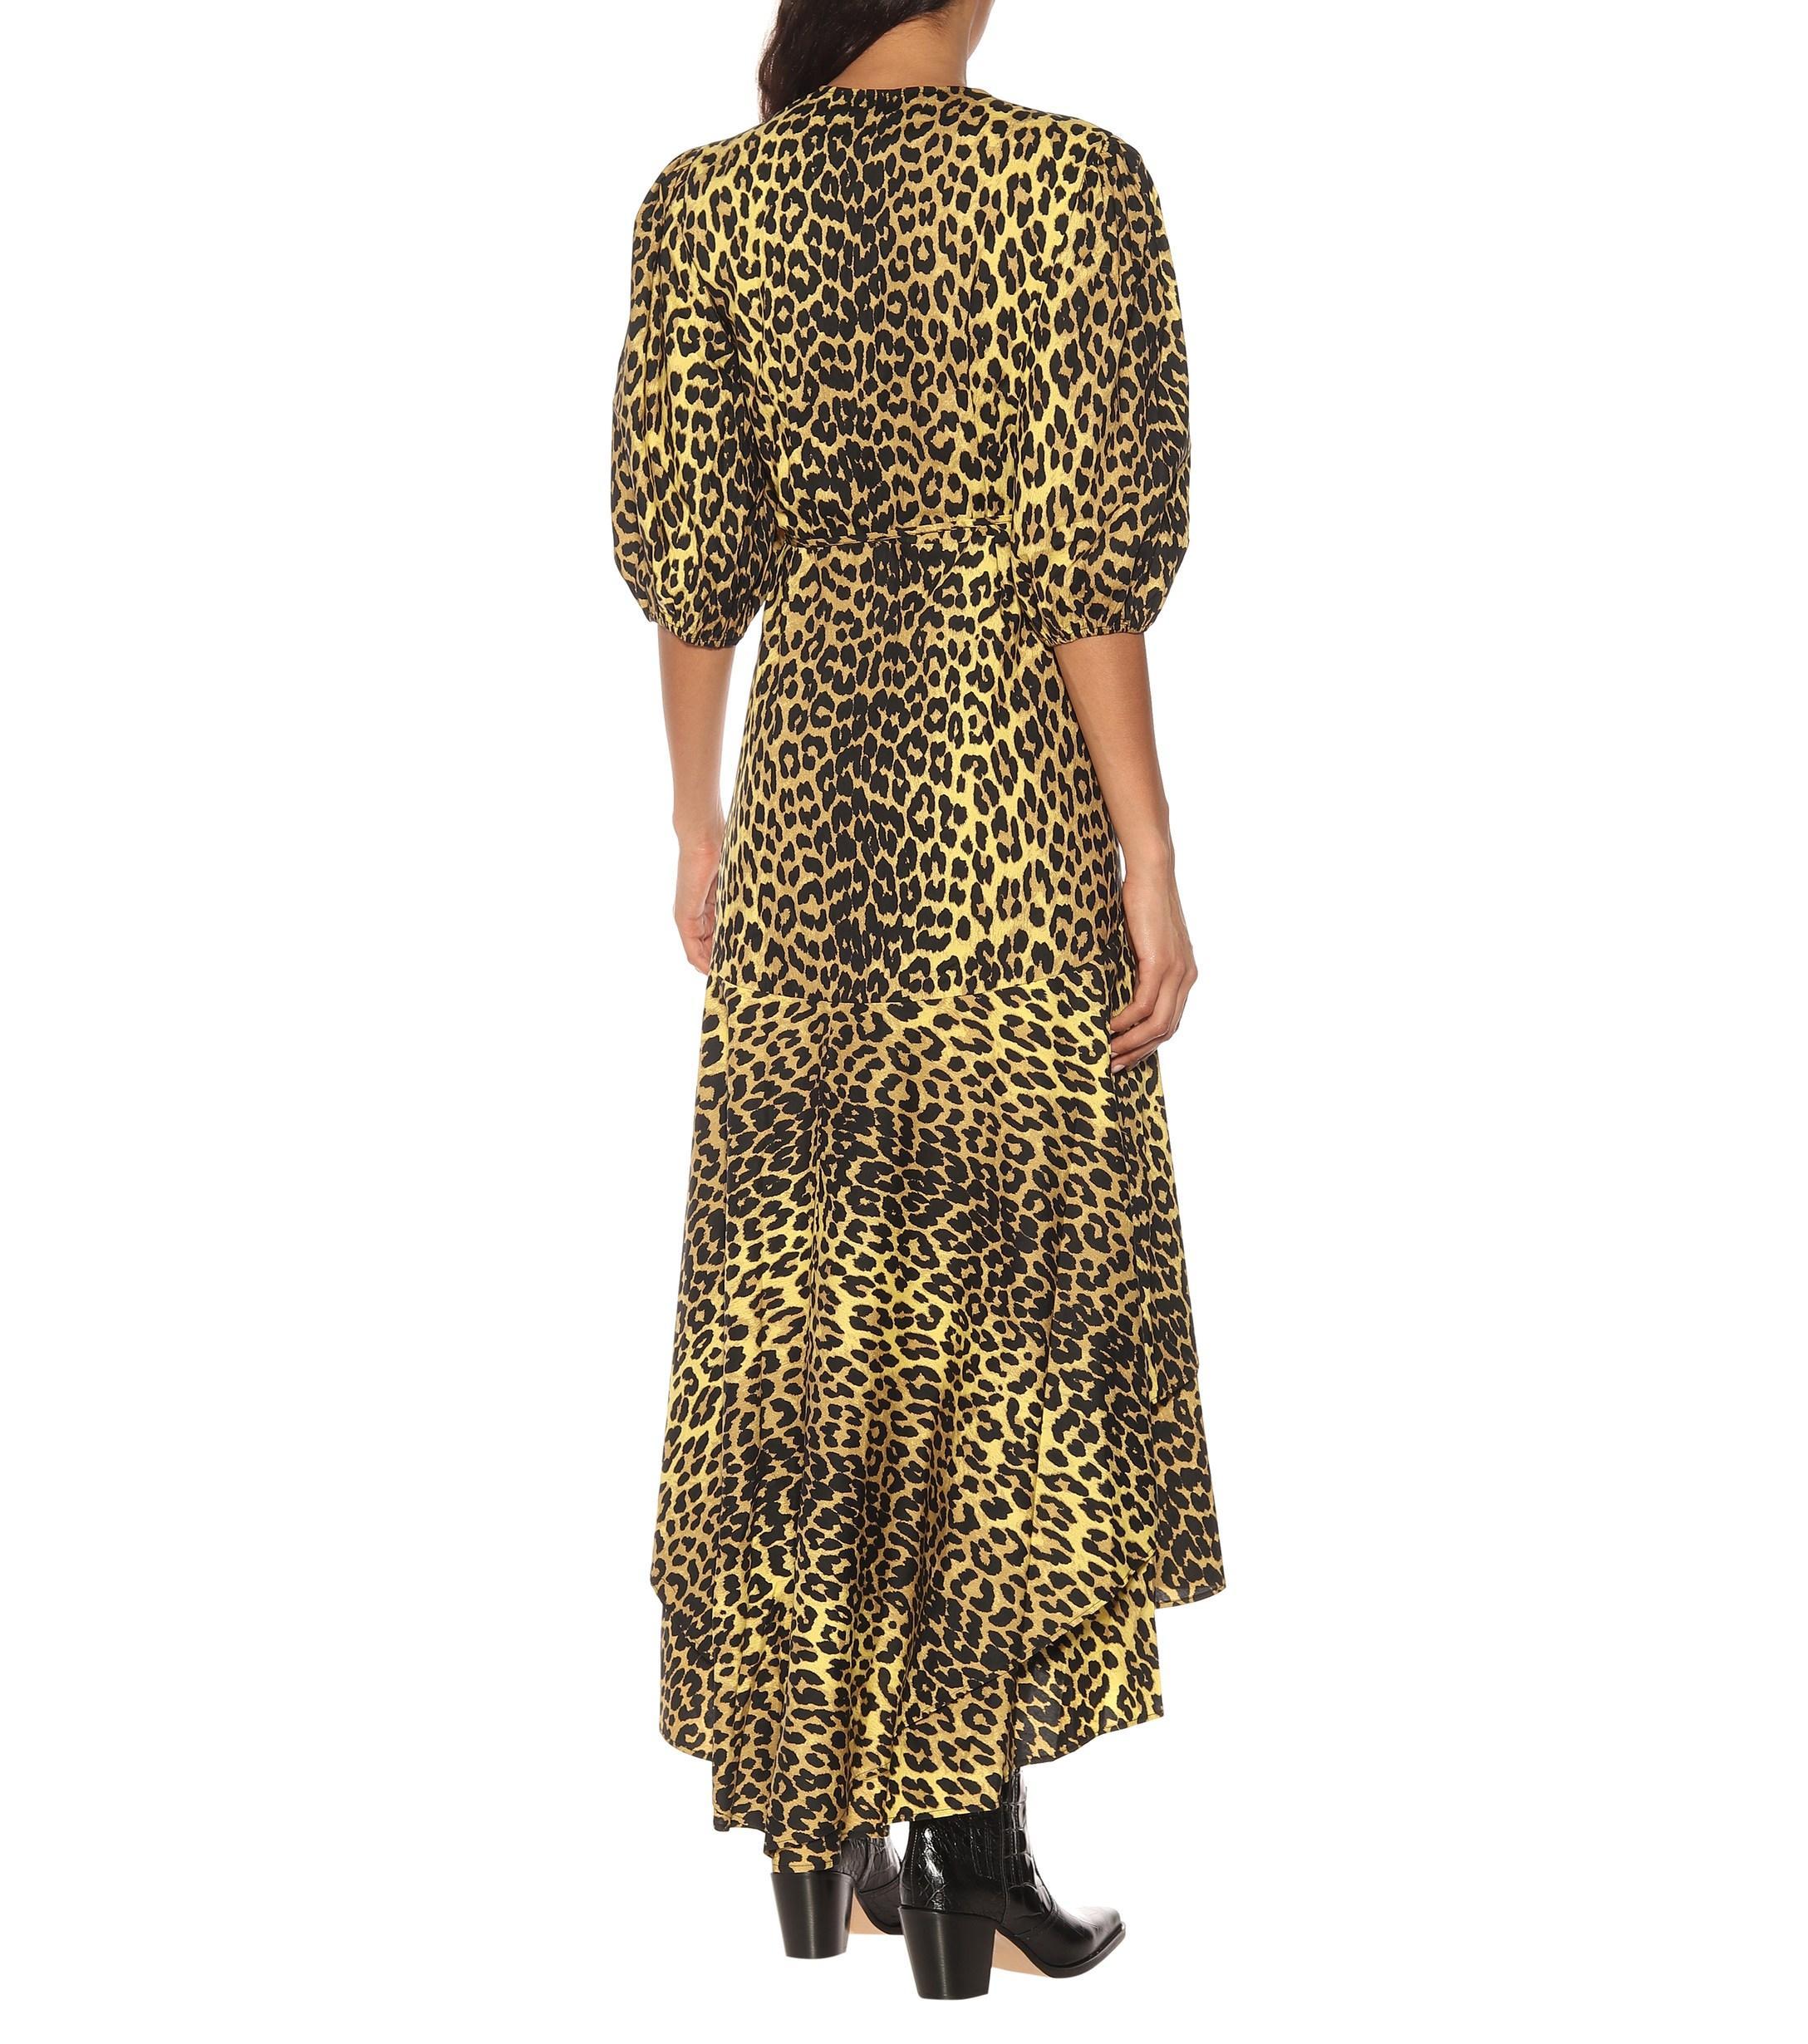 b6f6833d Ganni - Multicolor Printed Cotton Wrap Dress - Lyst. View fullscreen